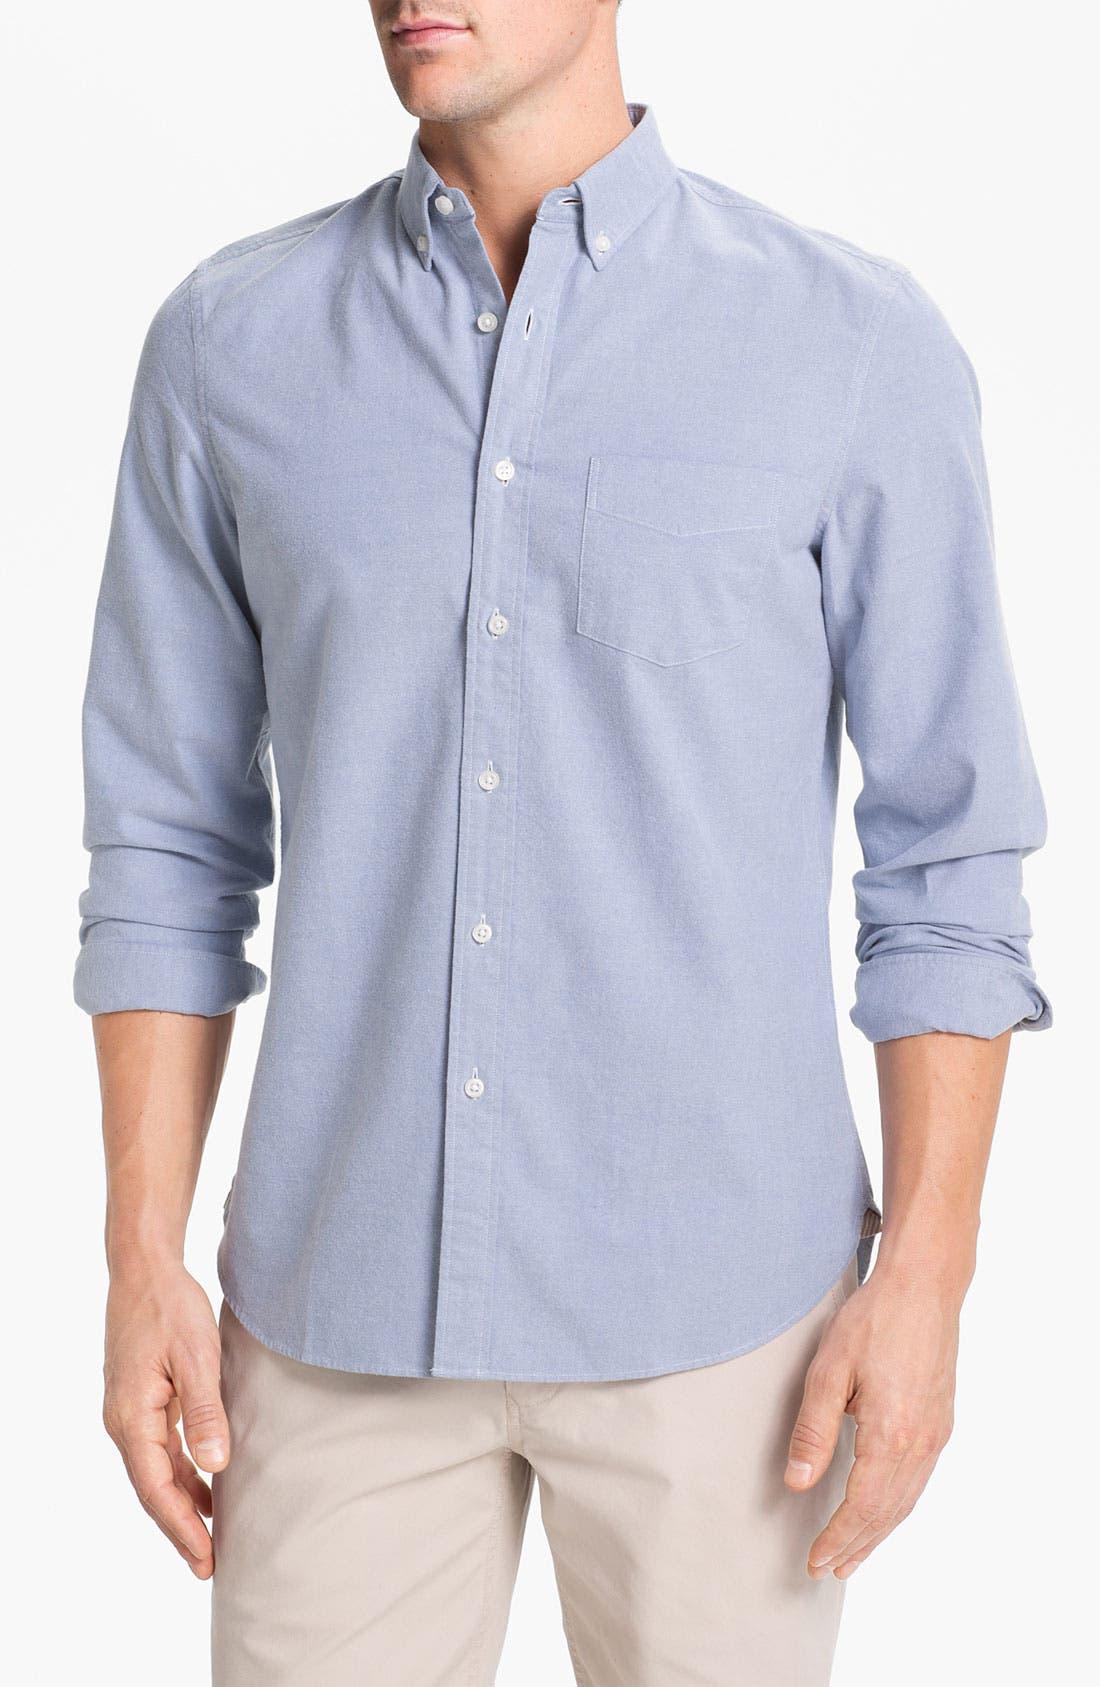 Main Image - Wallin & Bros. Trim Fit Oxford Sport Shirt